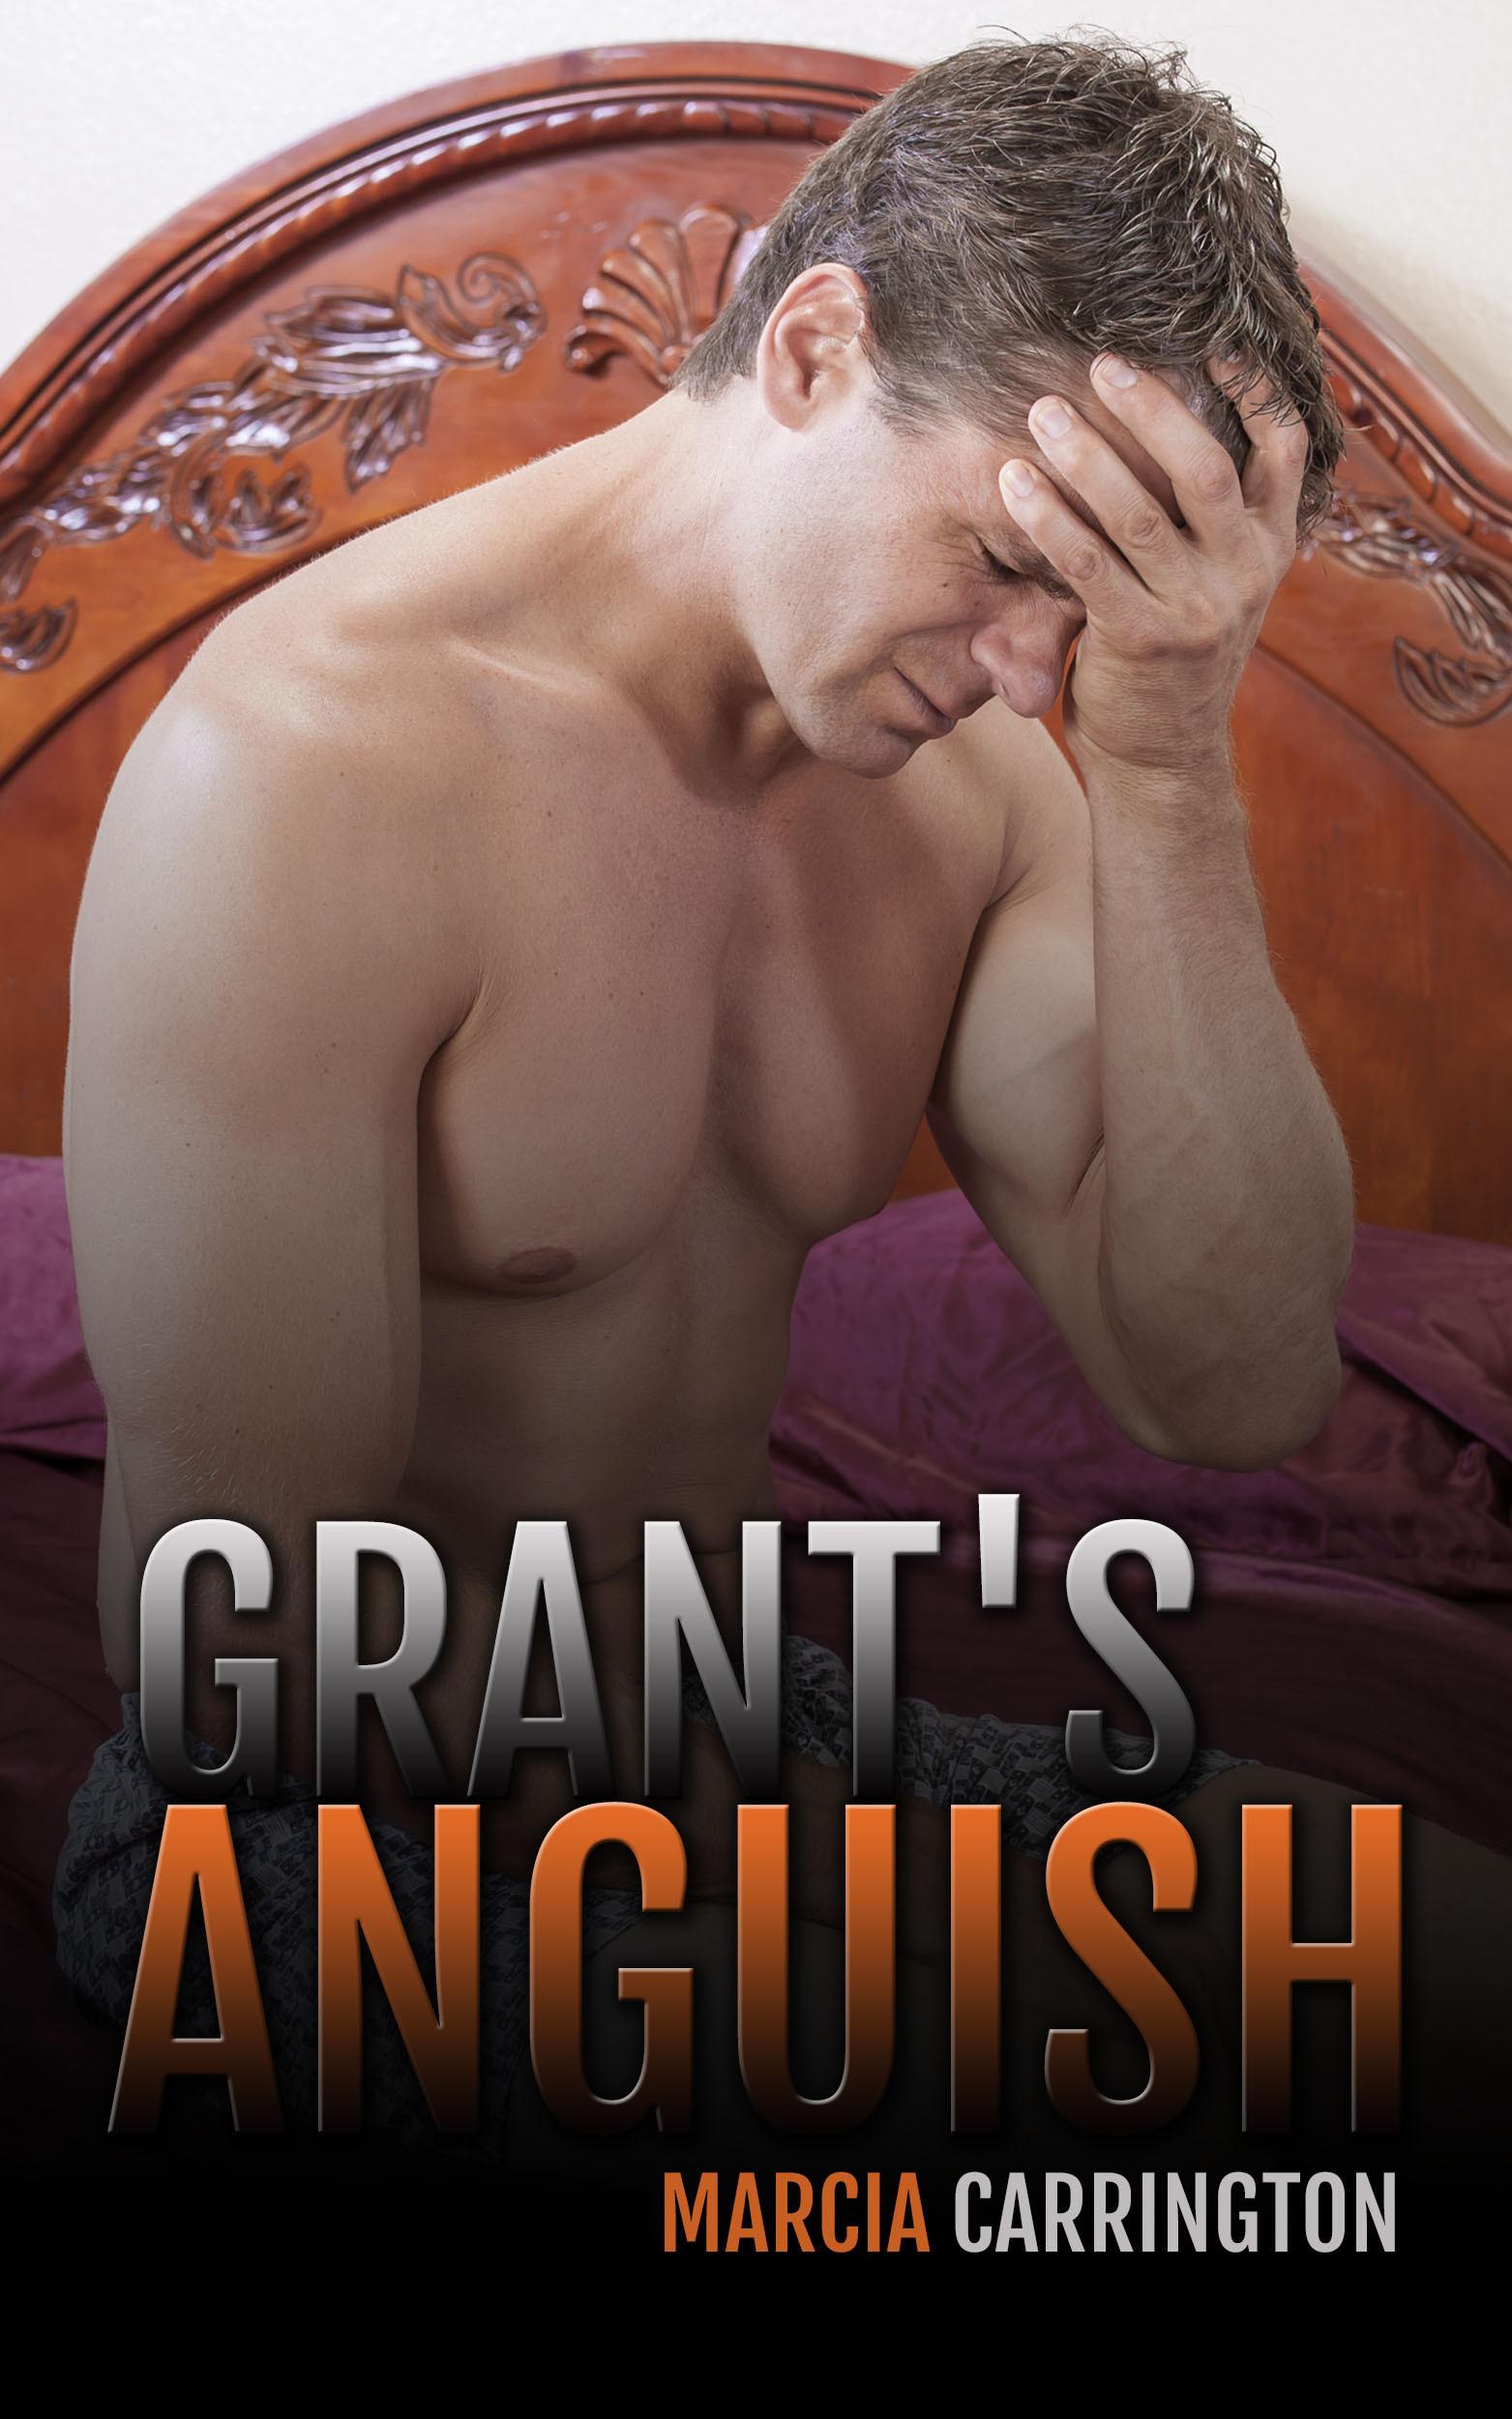 Grants Anguish  by  Marcia Carrington